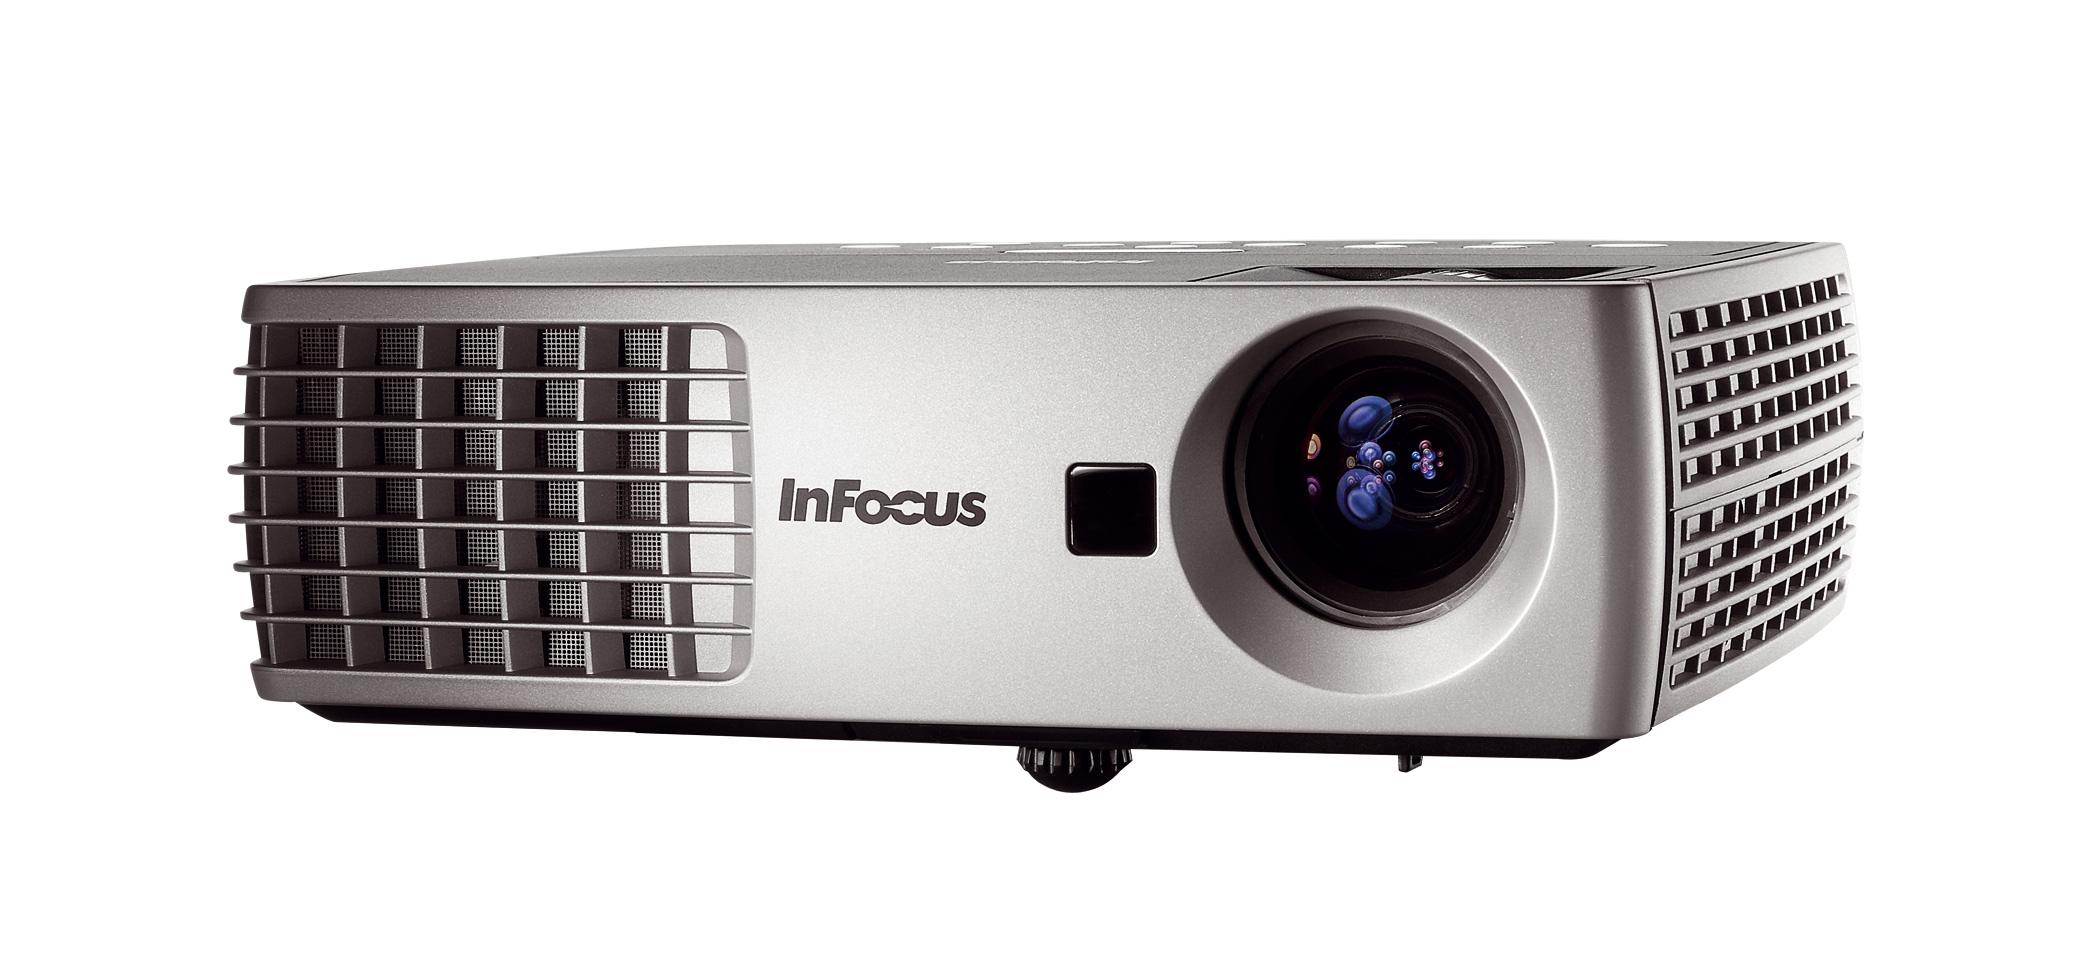 Infocus Projektoren In1100 Xga Dlp Beamer Cus Projector In226 Projektor